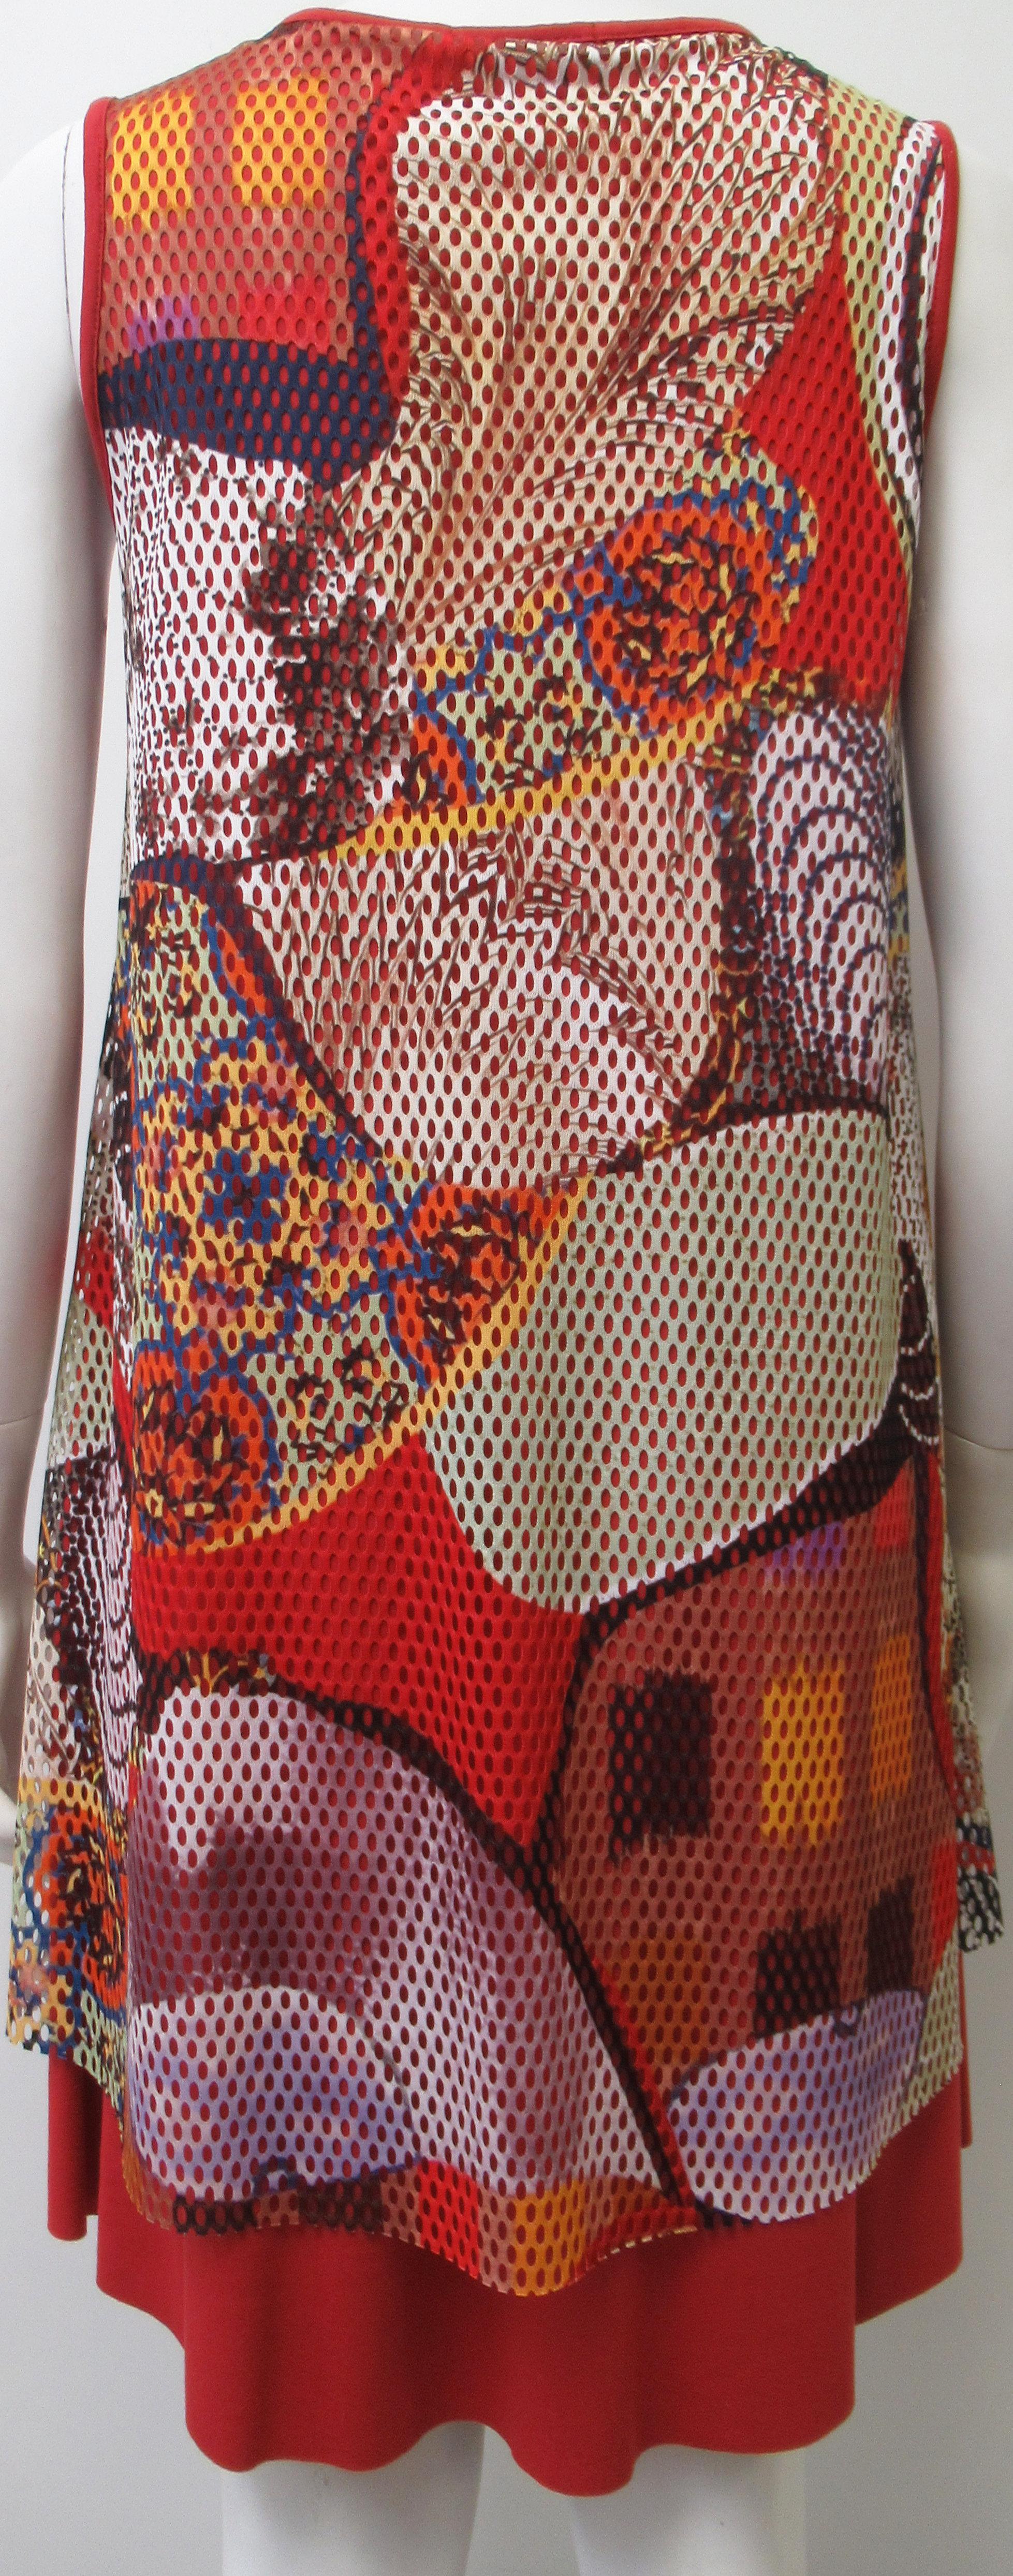 Maloka: Puzzle Pieces Abstract Art Midi Dress (2 Left!)